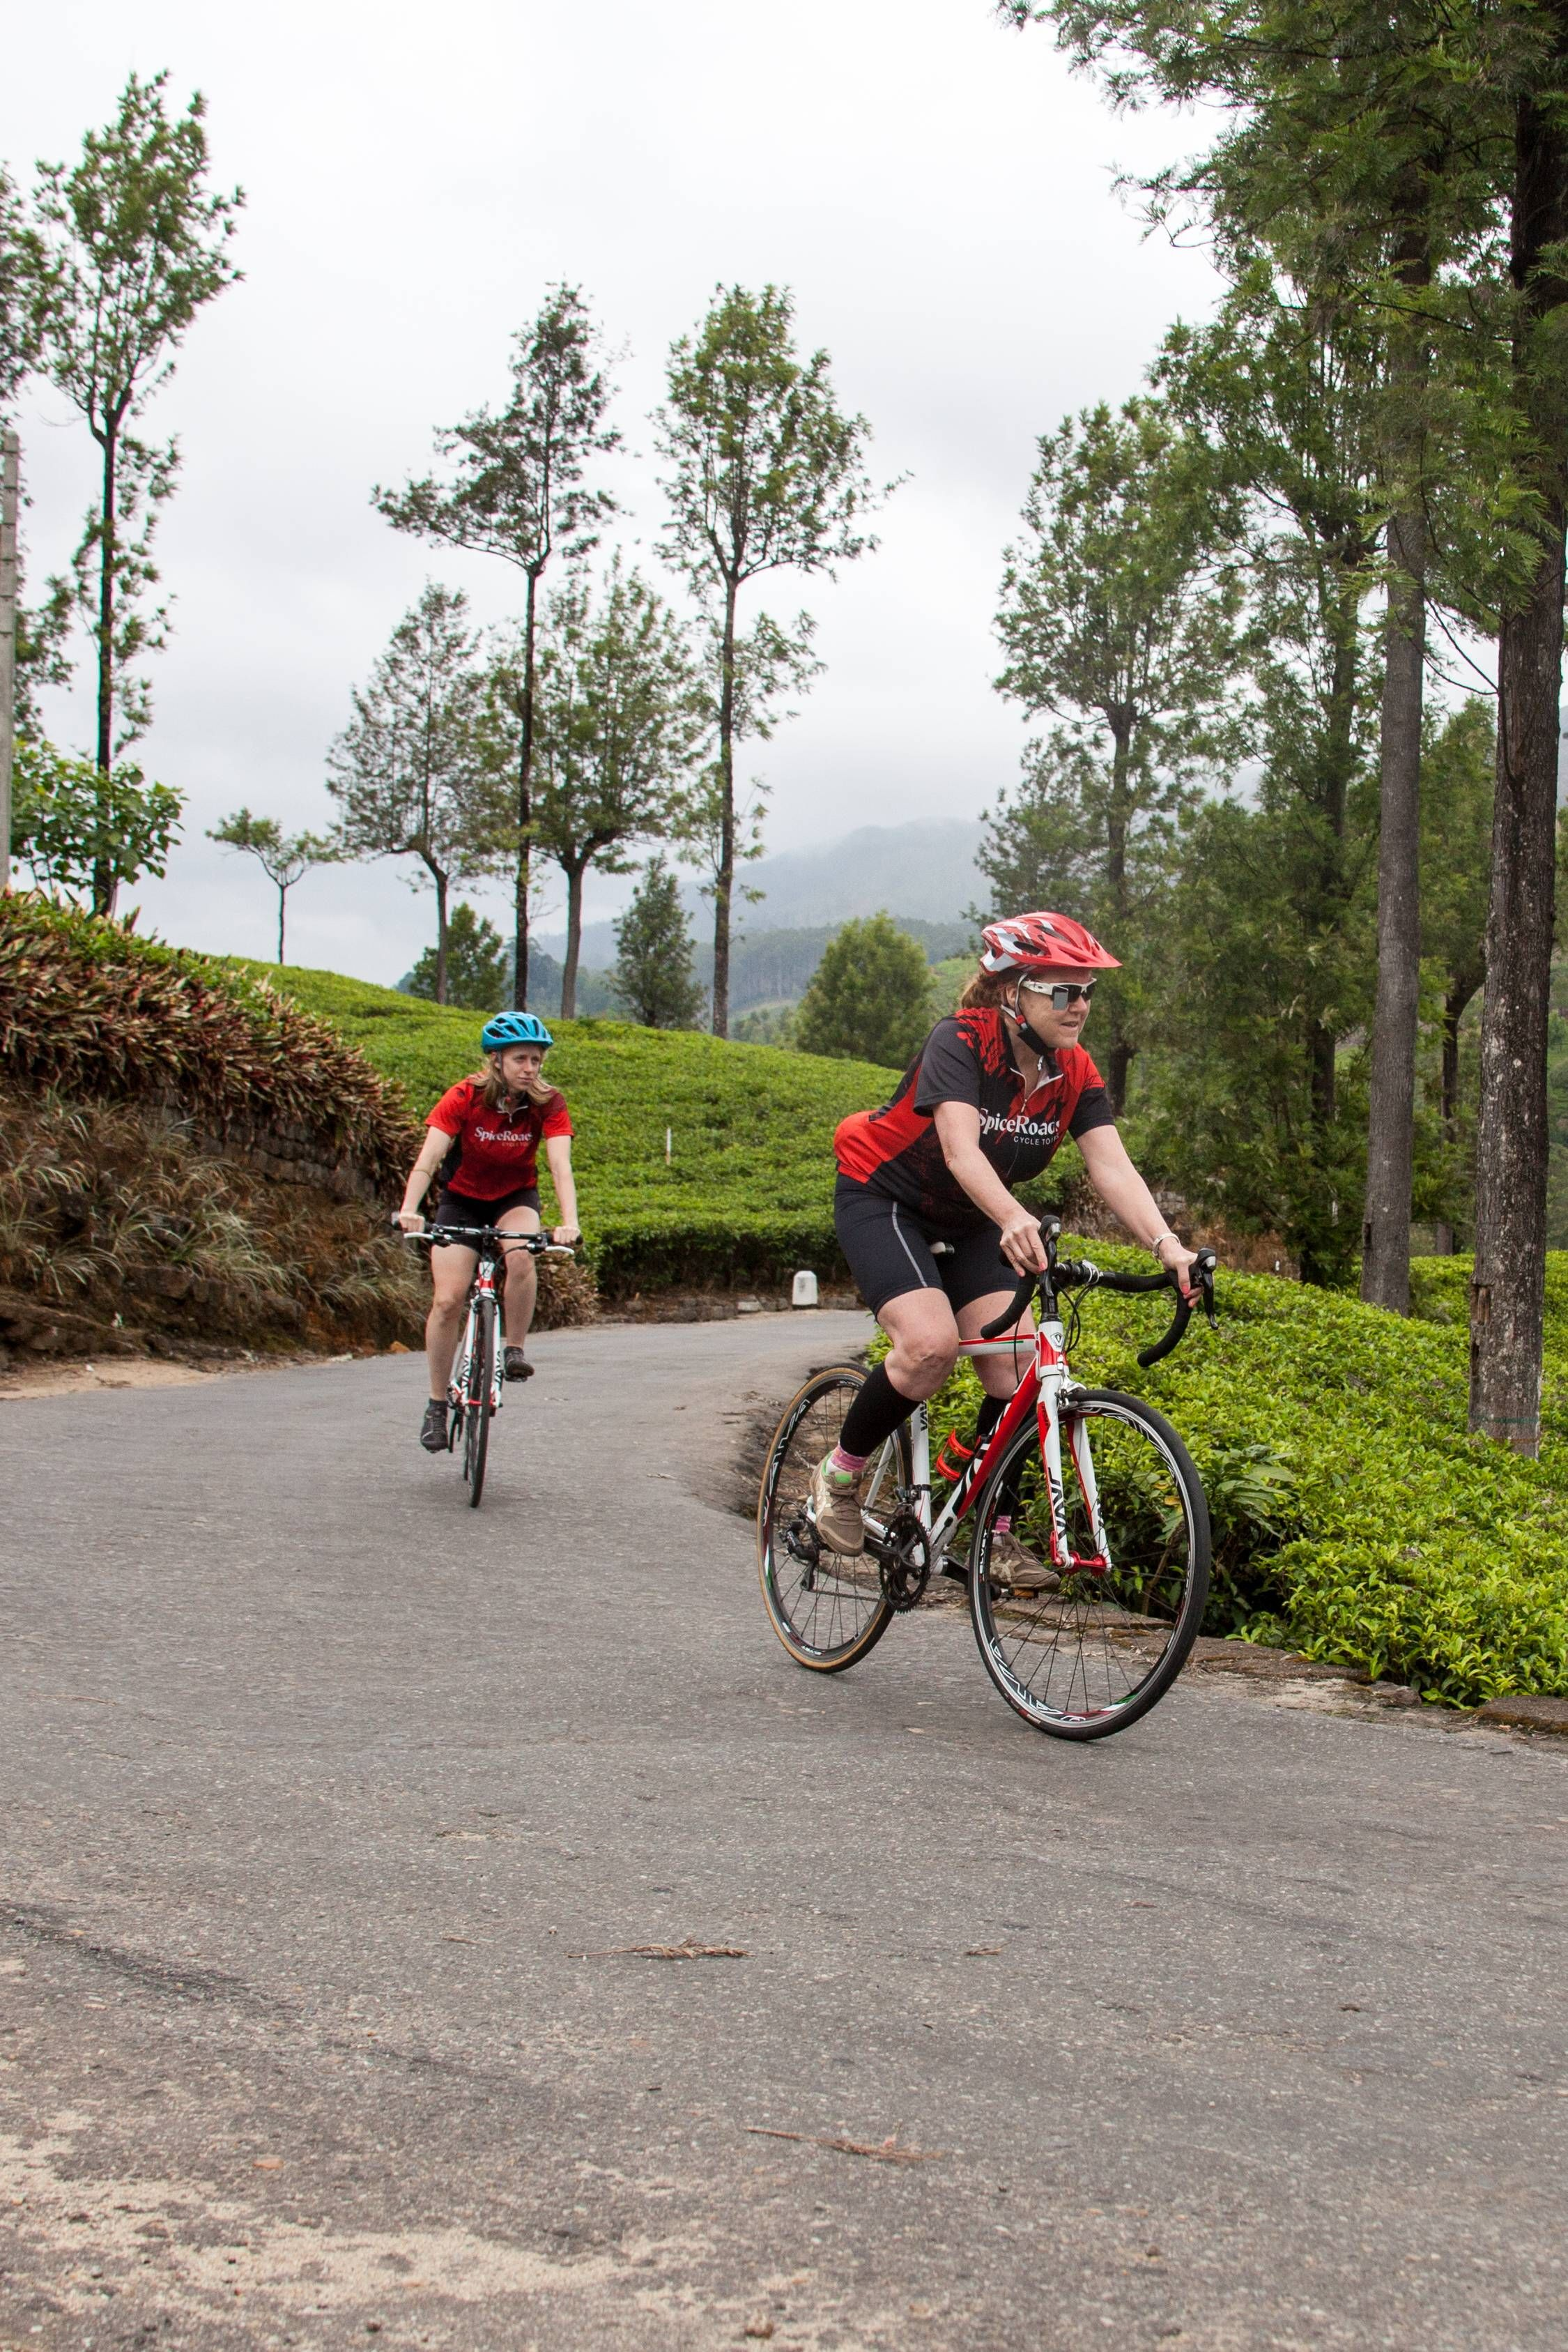 Take This Road Bike Trip If You Love Long Cycling Trips On Flat